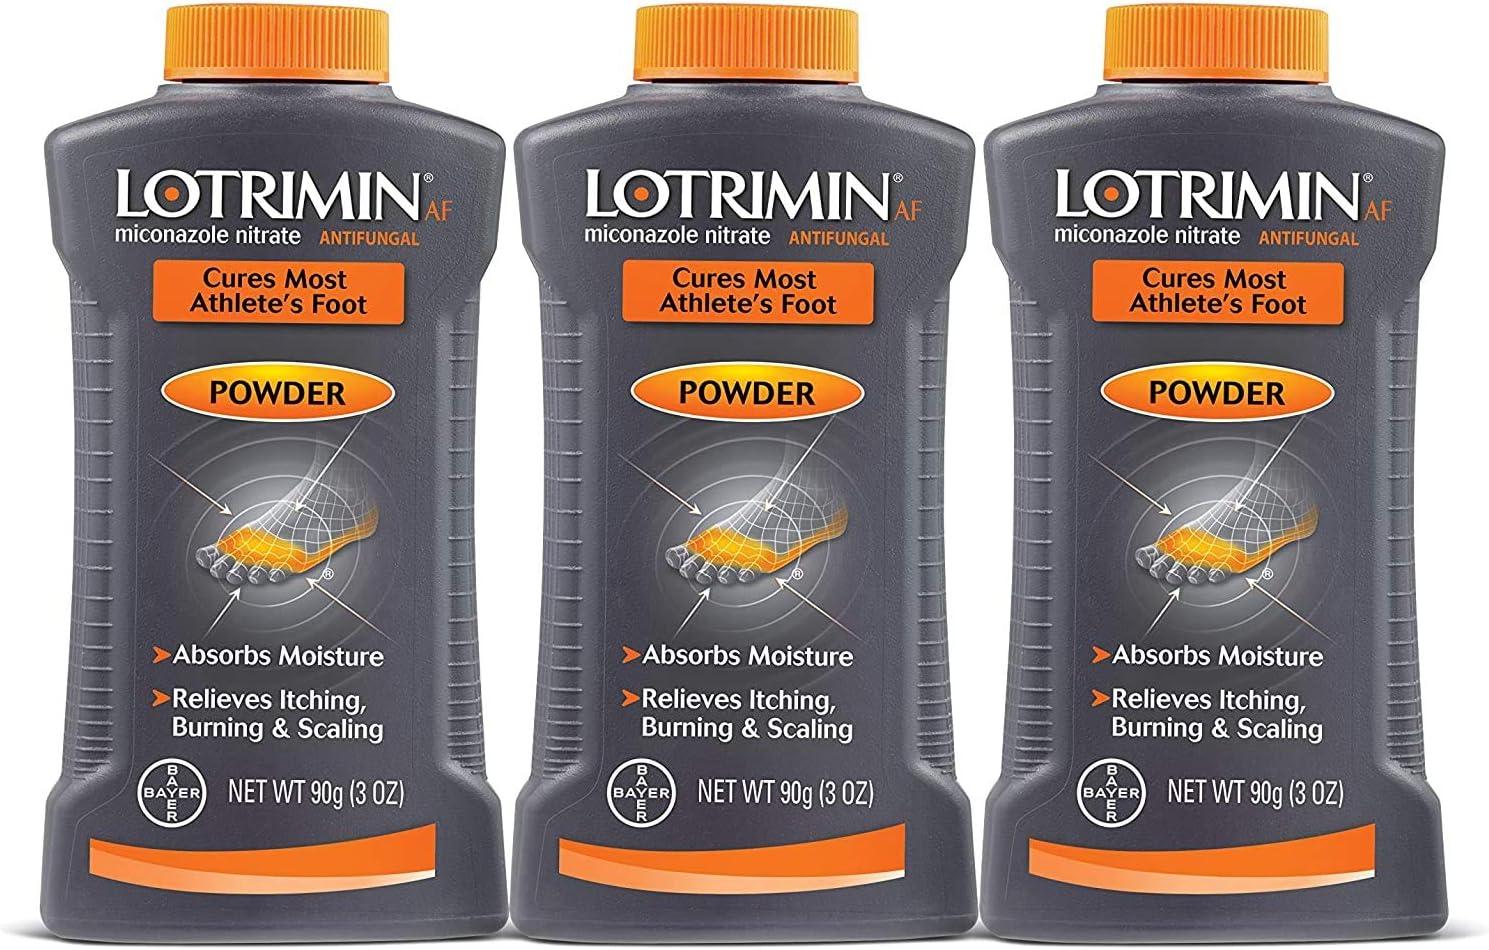 Lotrimin AF Athlete's Foot Antifungal Powder -Miconazole Nitrate 2% Treatment, 3 Oz (Pack of 3), 9 Oz